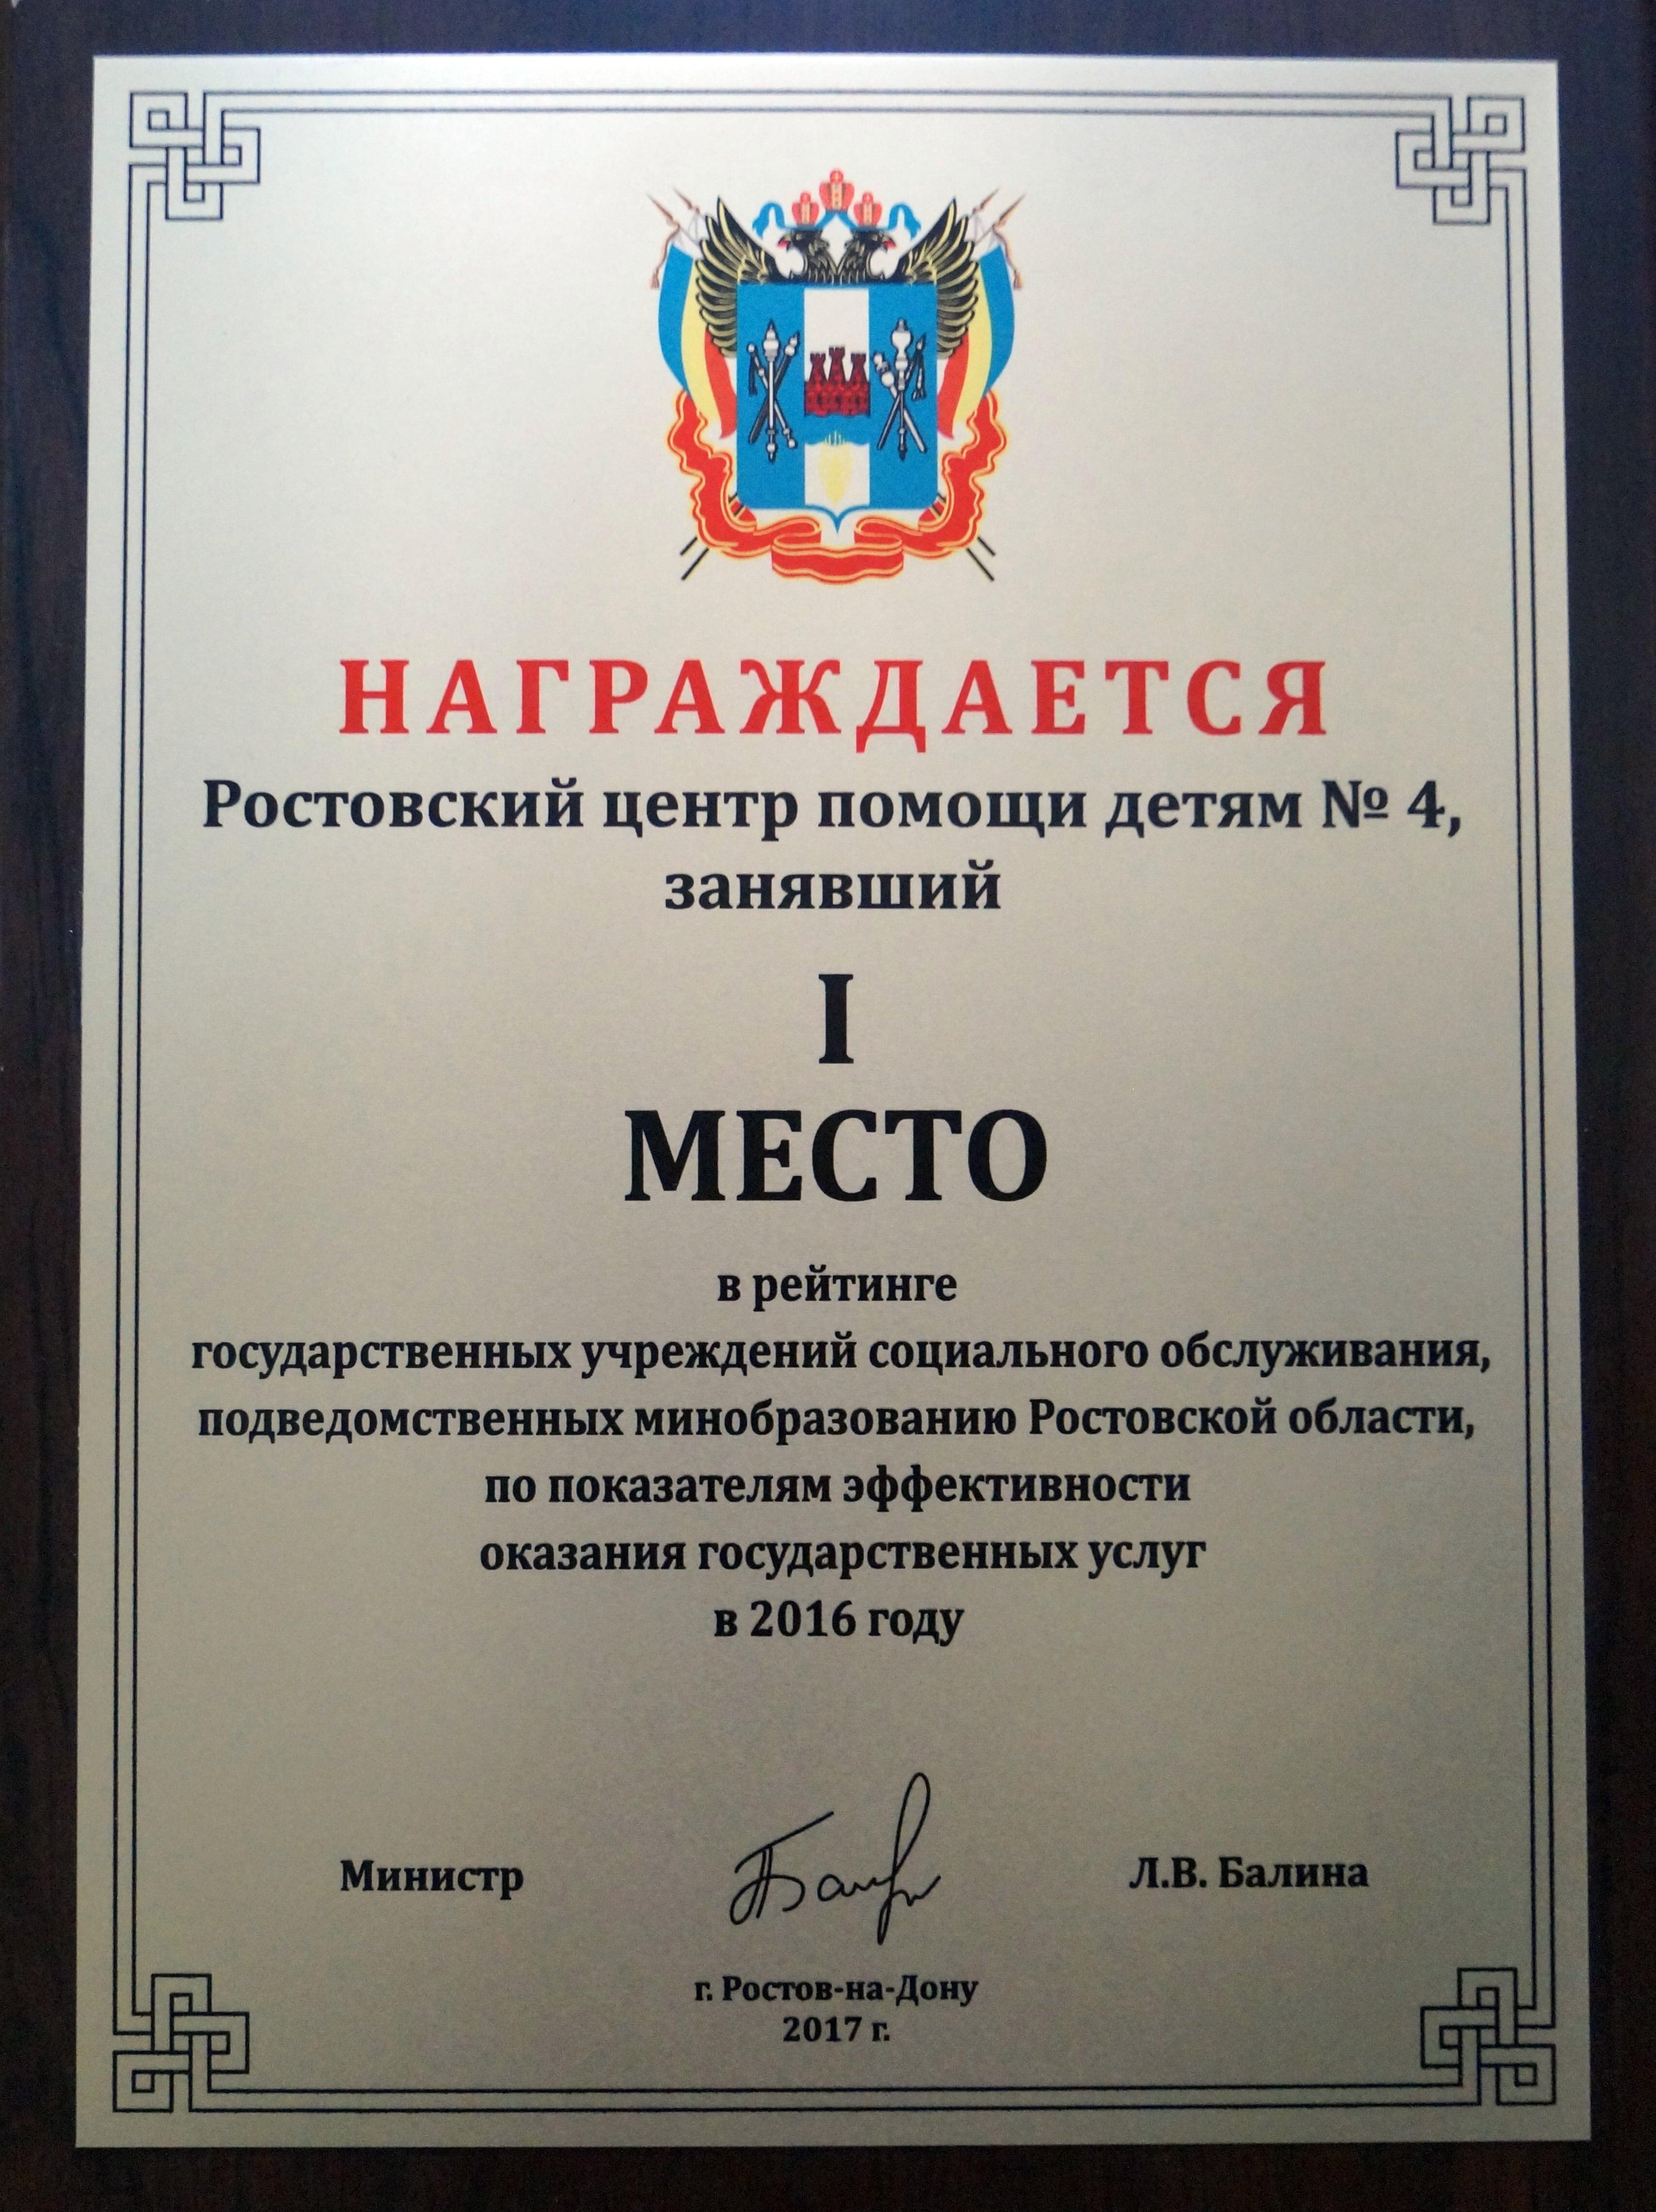 Диплом 1 место, 2016год.